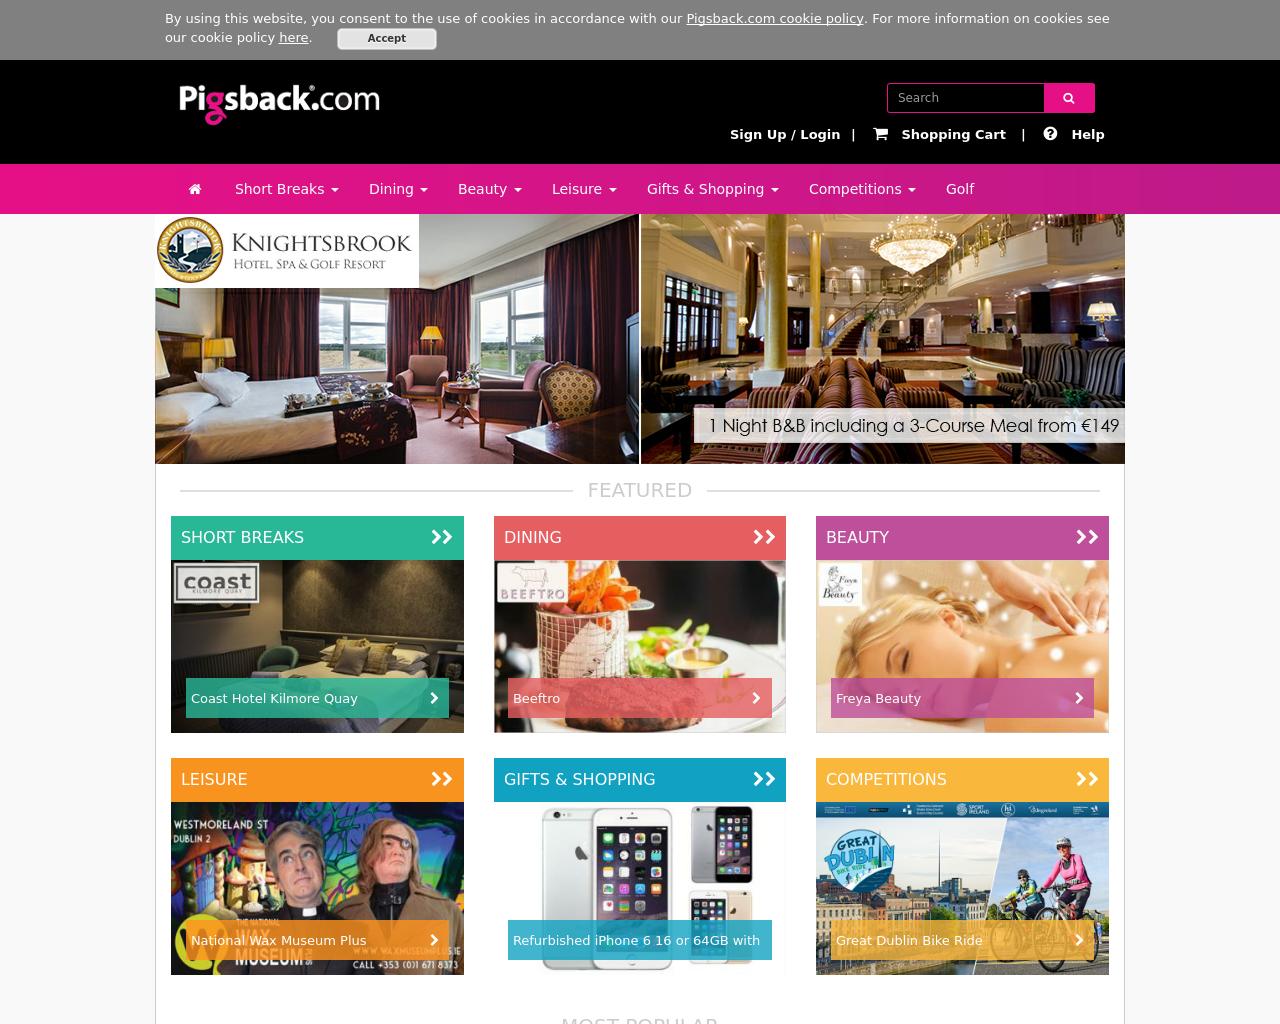 Pigsback.com-Advertising-Reviews-Pricing